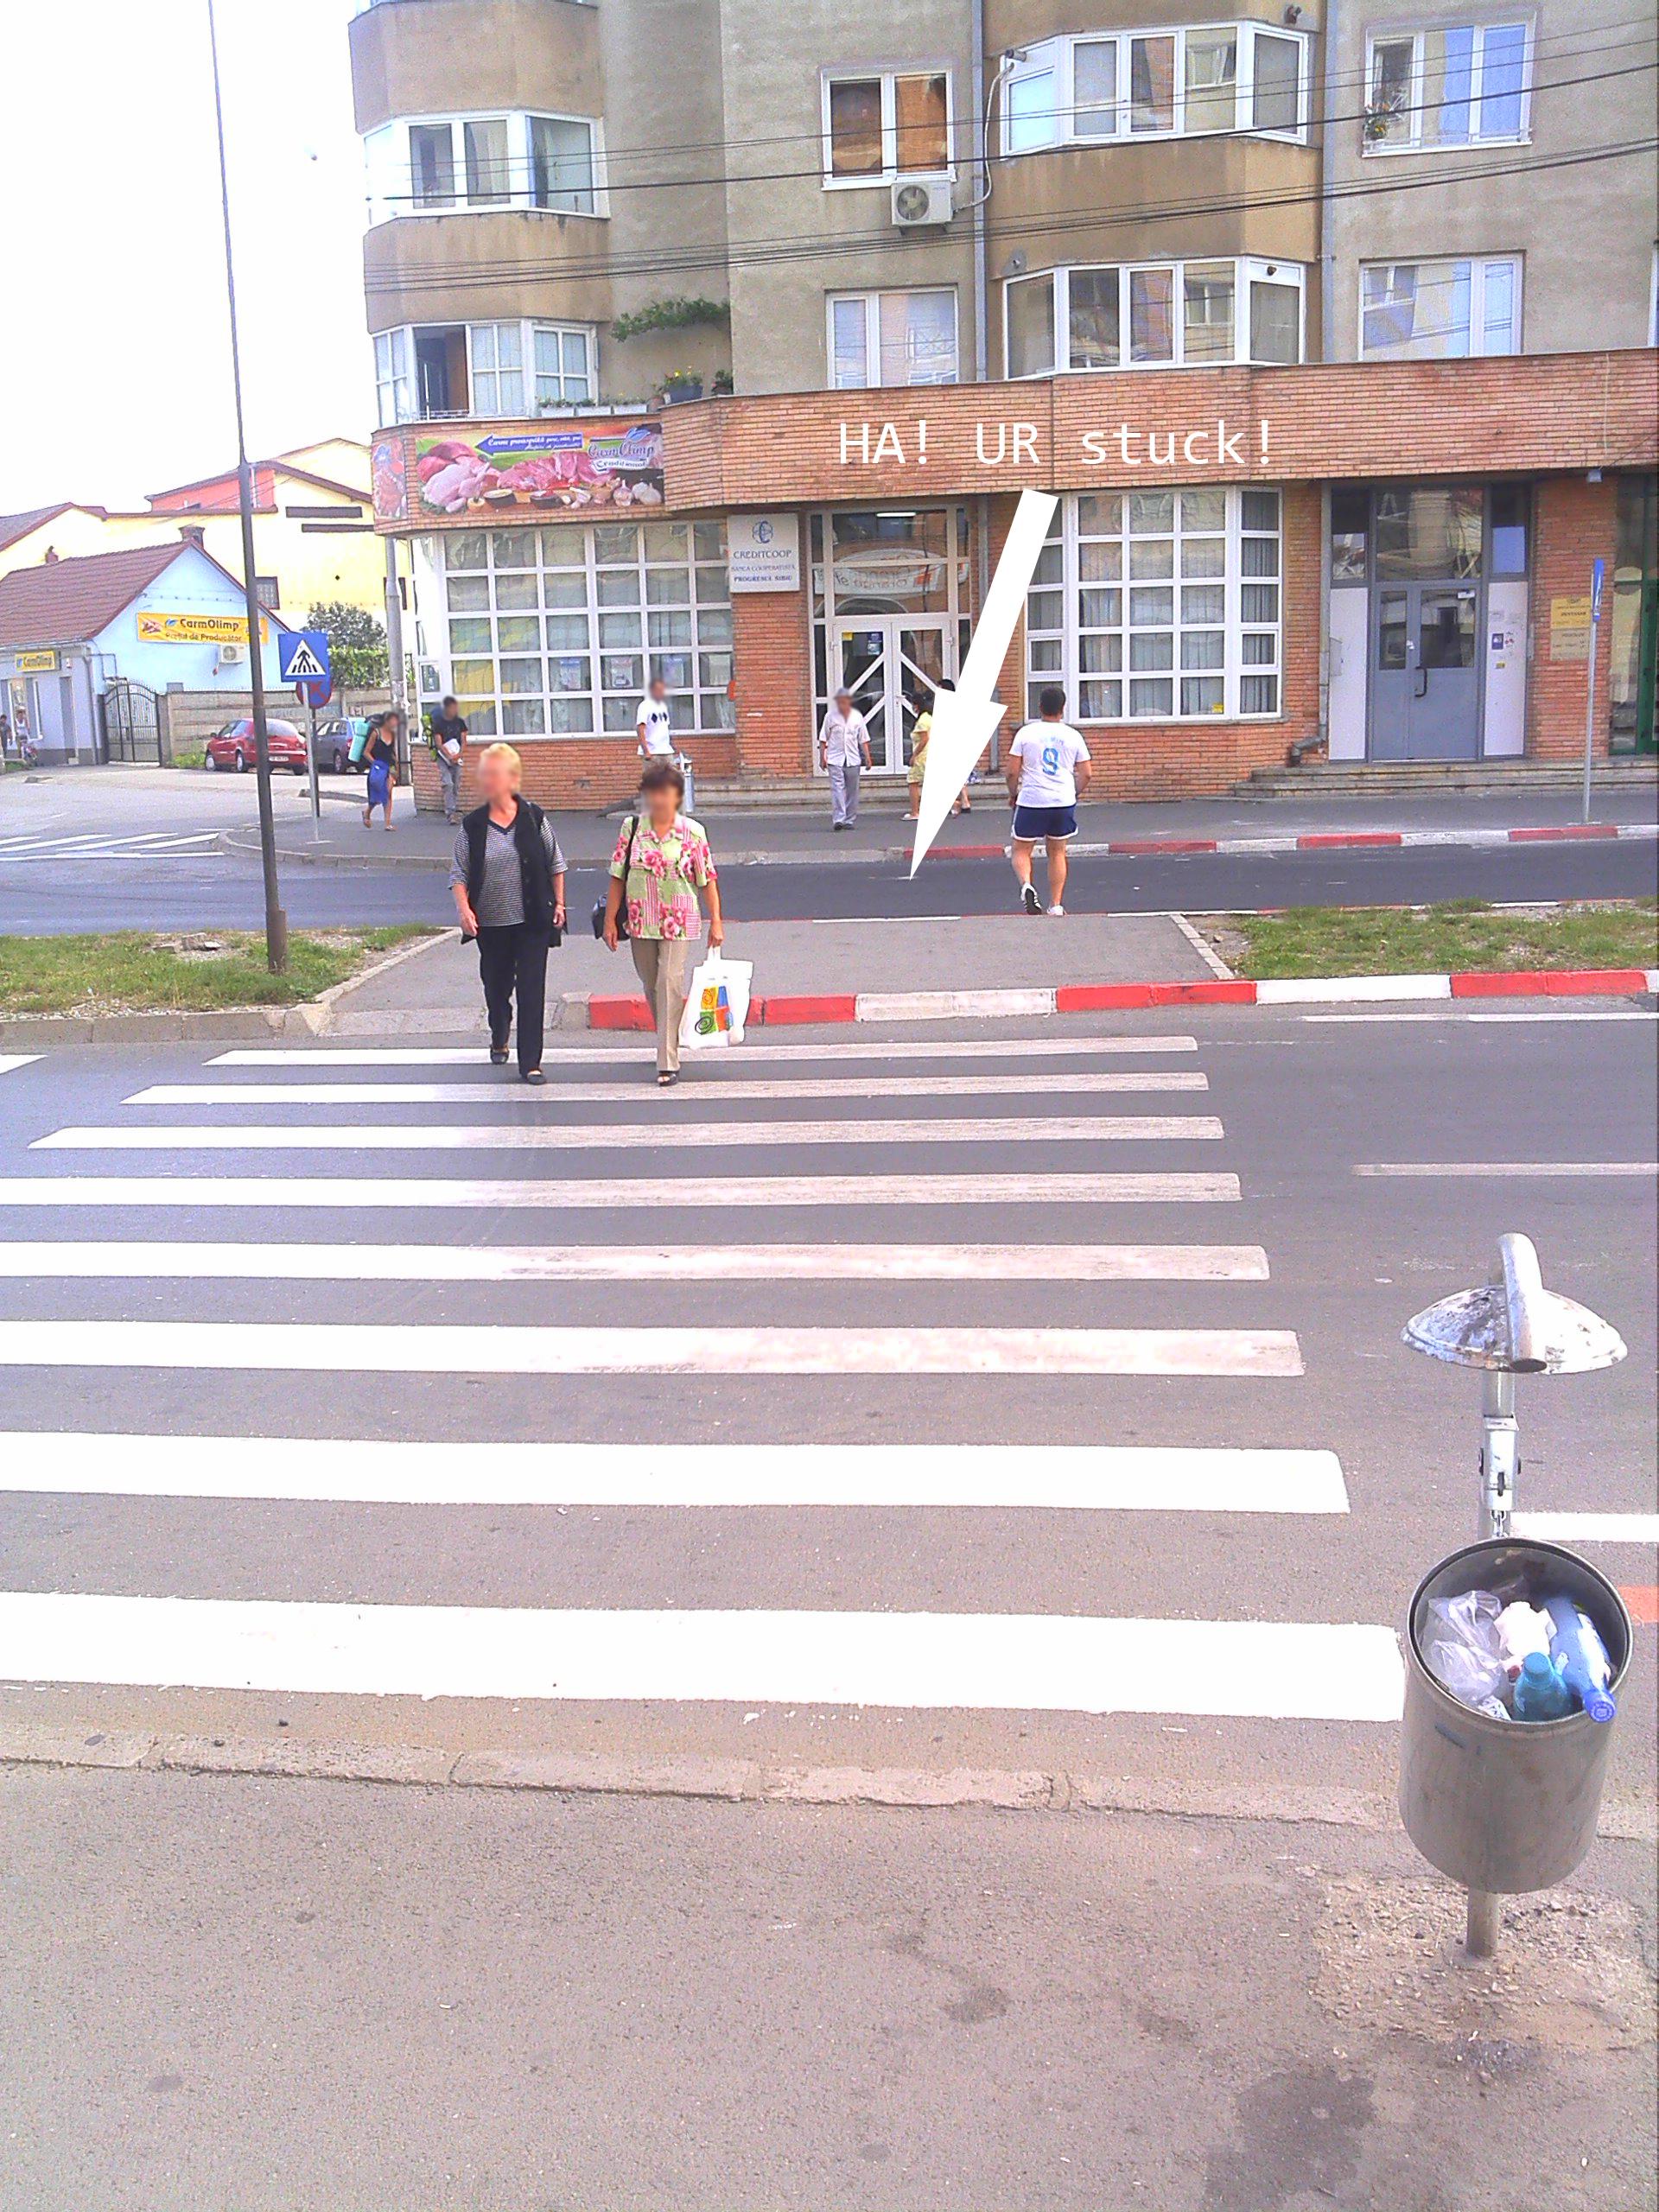 Missing zebra crossing